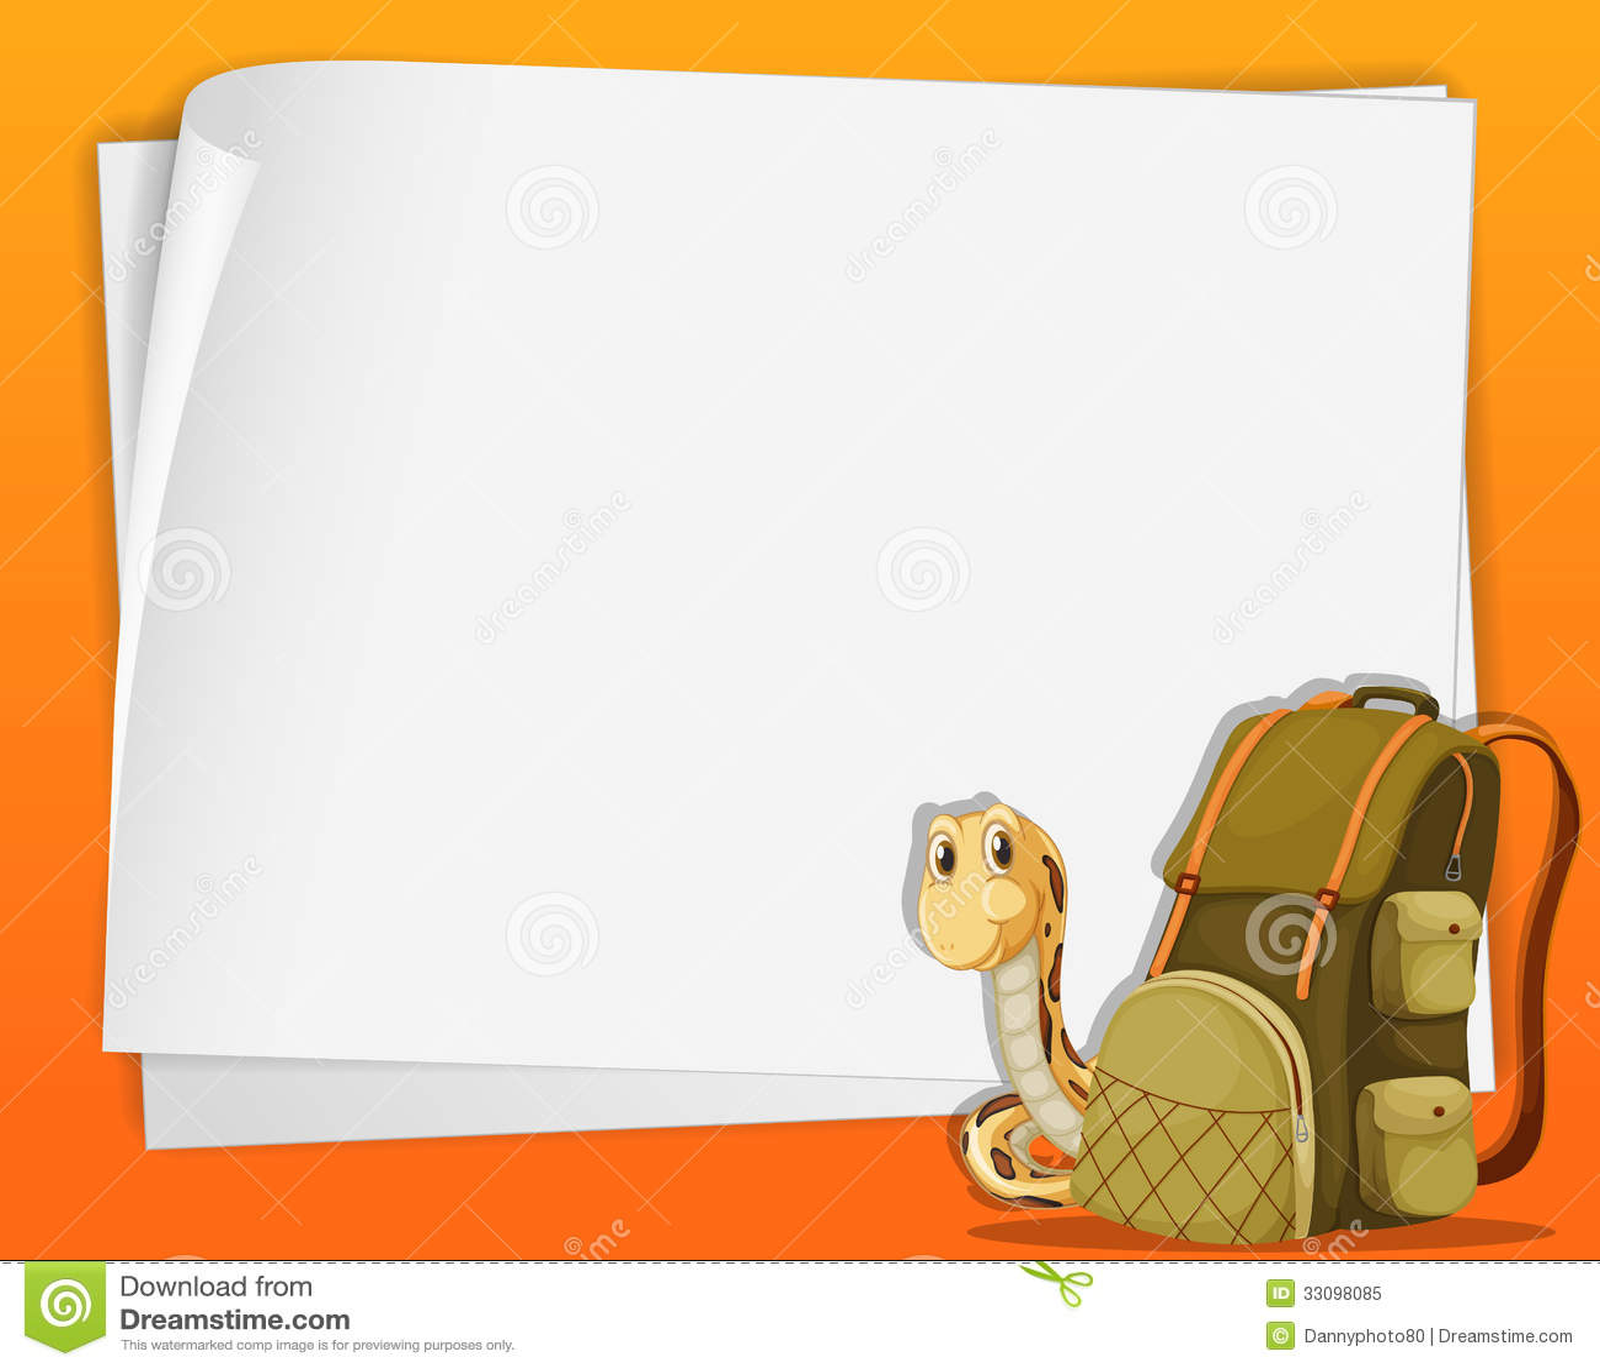 Theme paper format